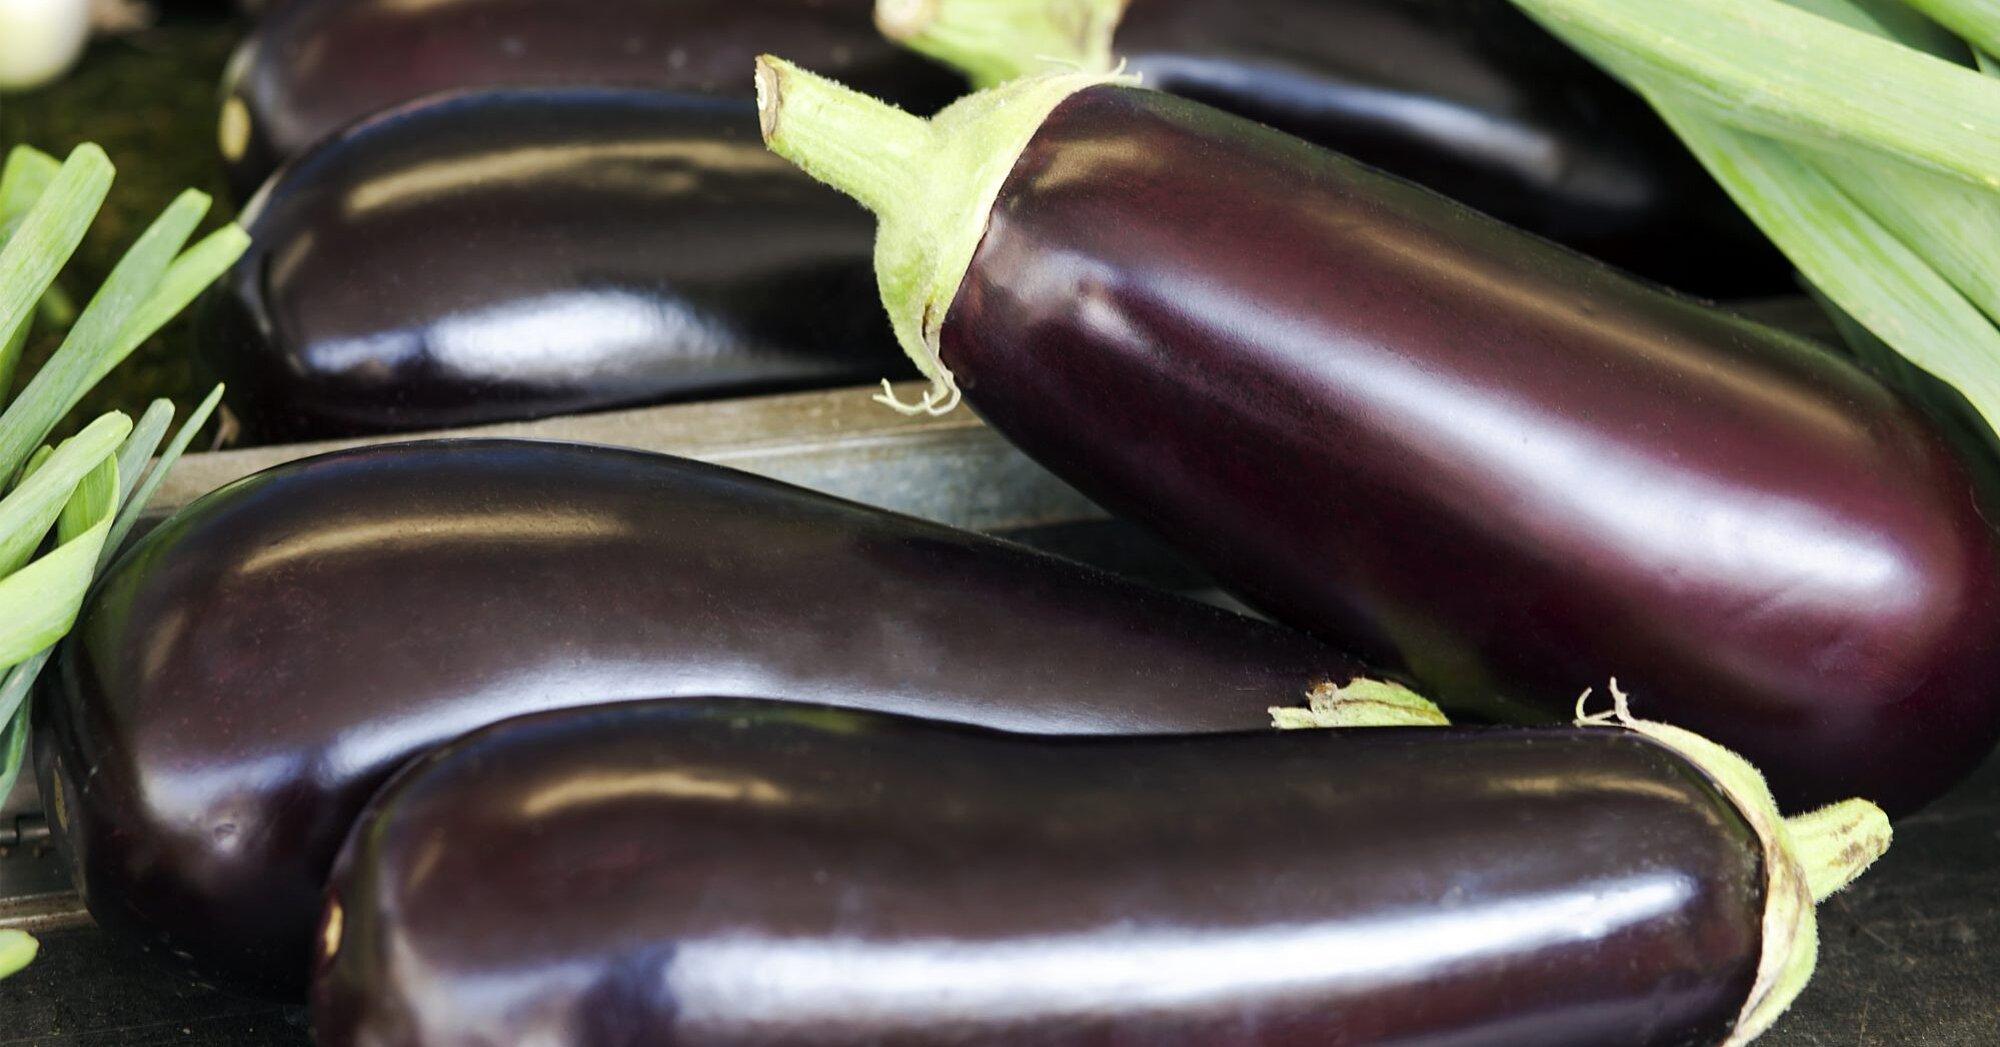 Wait, Why Are Eggplants Called Eggplants?